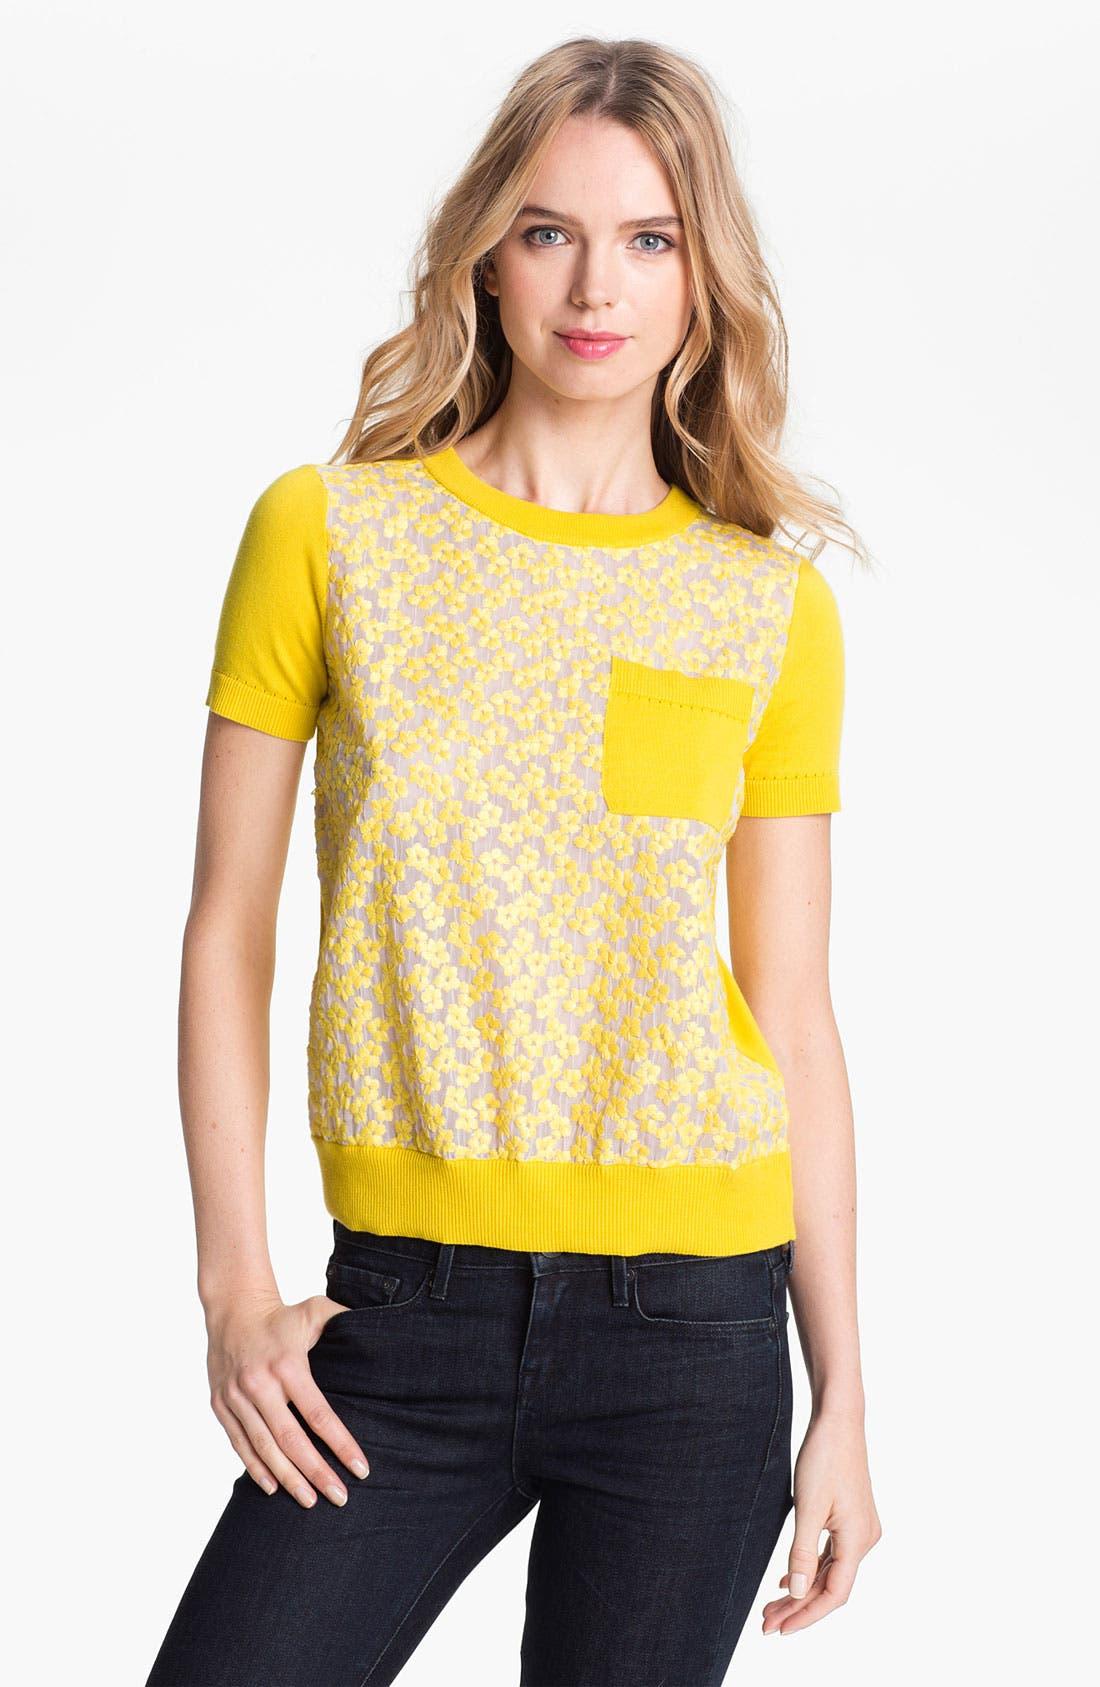 Main Image - kate spade new york 'mercy' cotton sweater